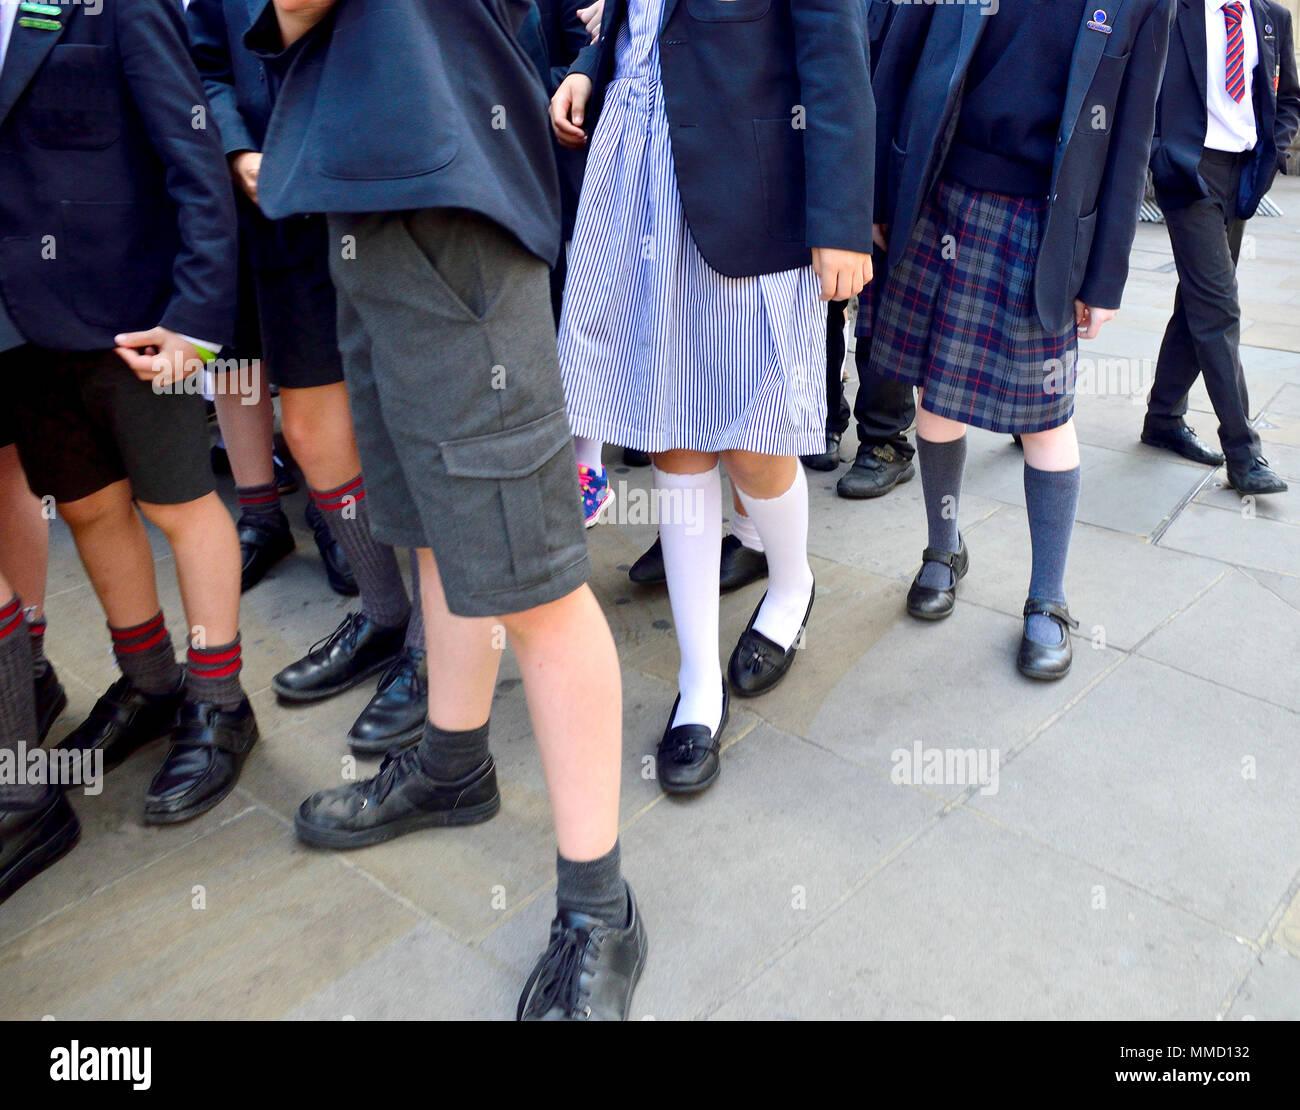 London,England, UK. Primary school children in uniform - anonymous feet and legs - Stock Image